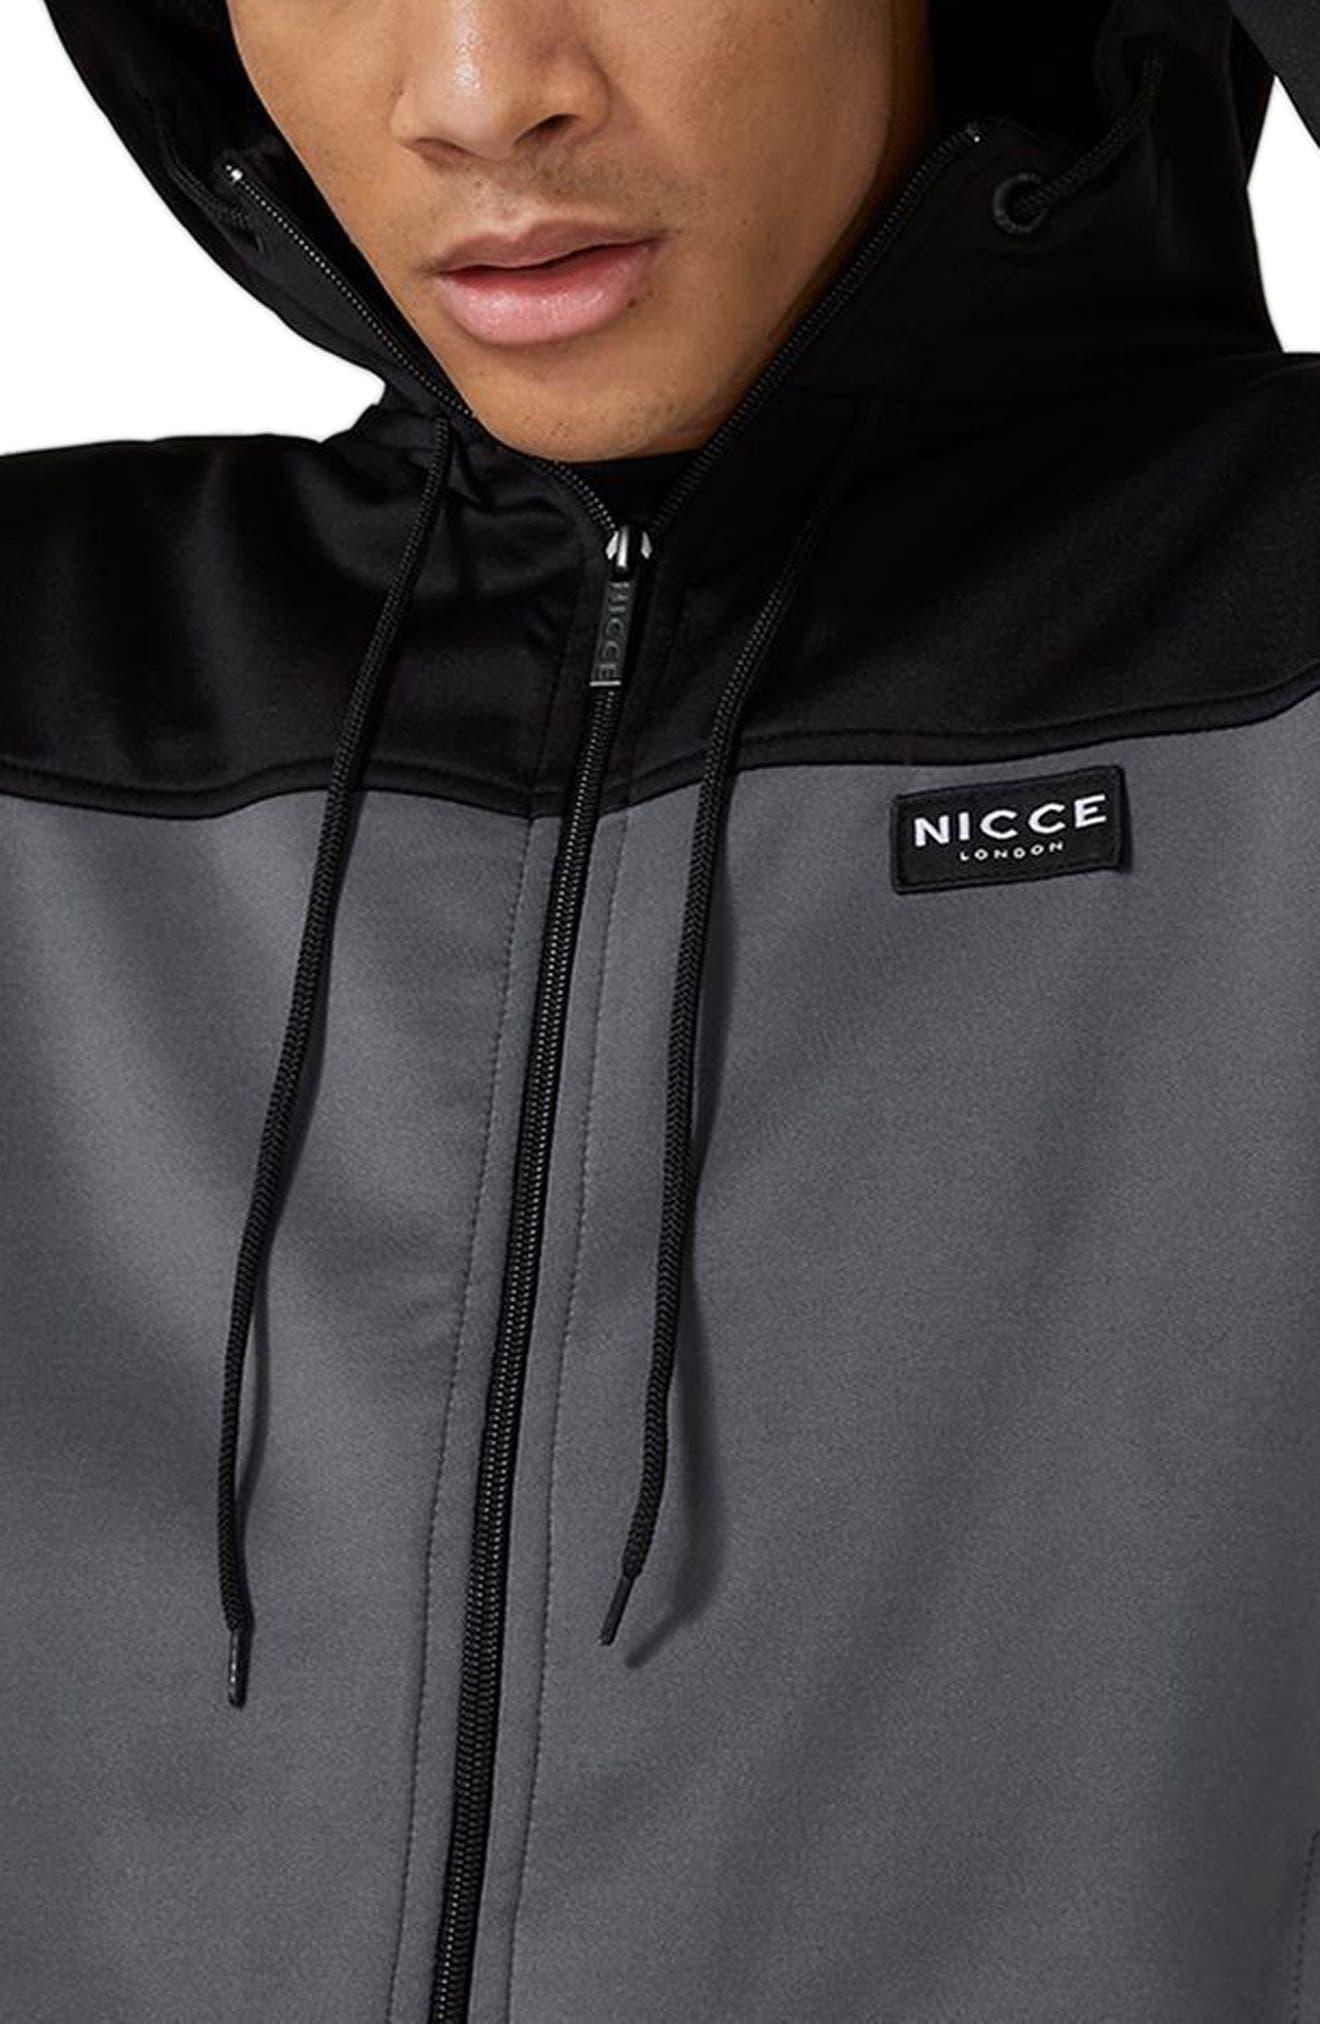 Topshop NICCE Hybrid Track Jacket,                             Alternate thumbnail 3, color,                             BLACK MULTI